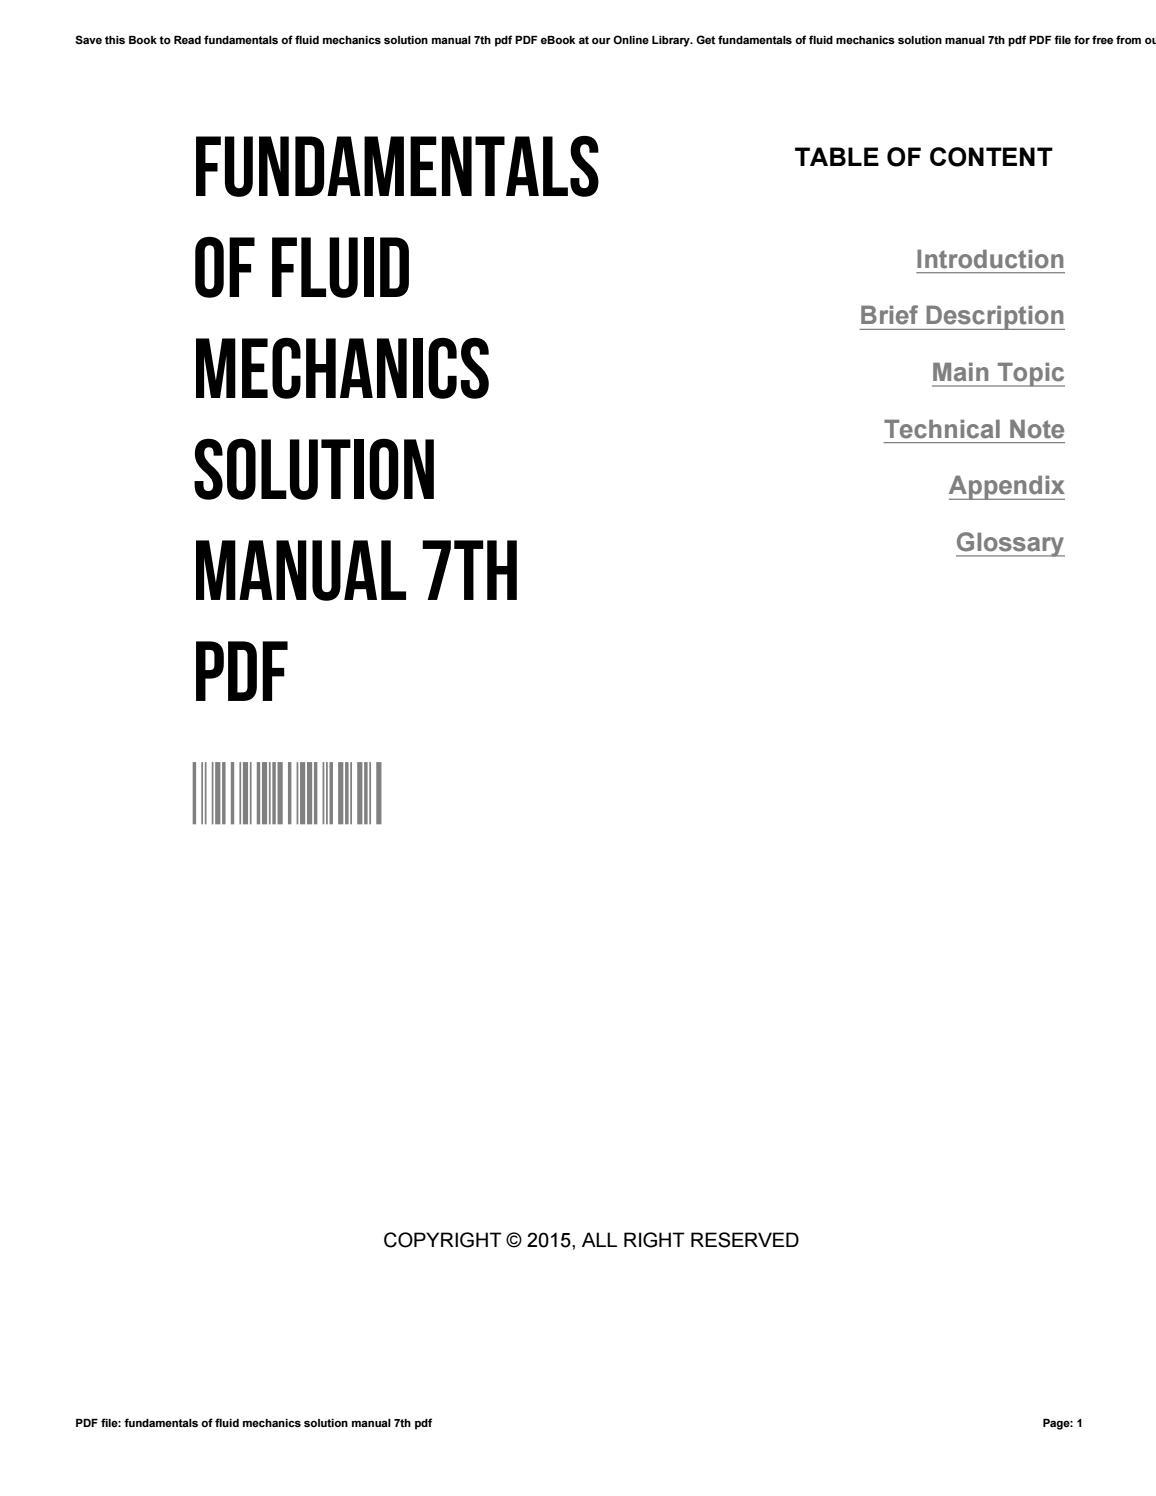 Fundamentals of fluid mechanics solution manual 7th pdf by